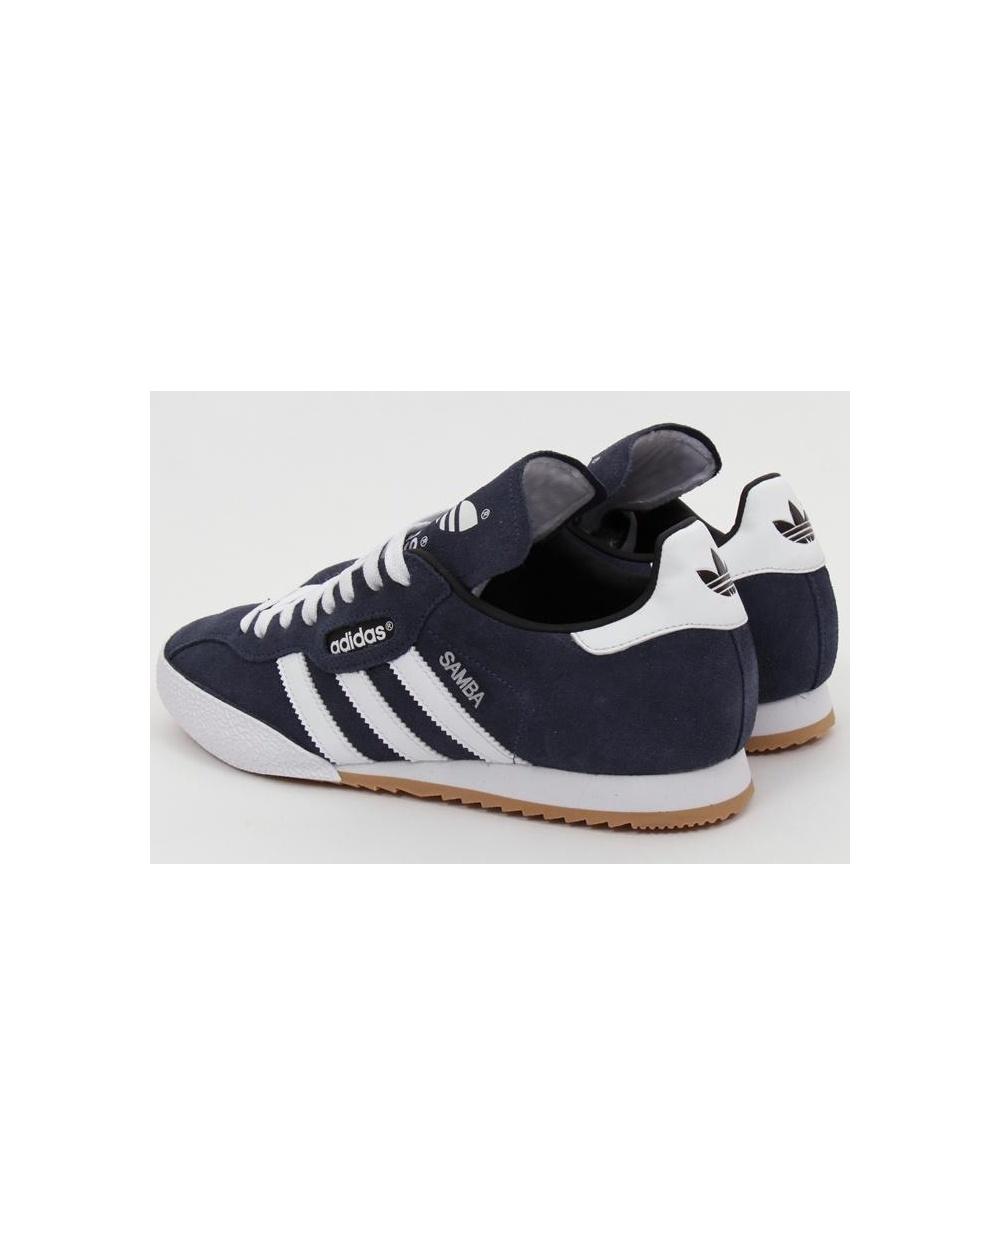 79100f474b5 Adidas Samba Super Suede Trainers Navy white - Adidas samba super ...